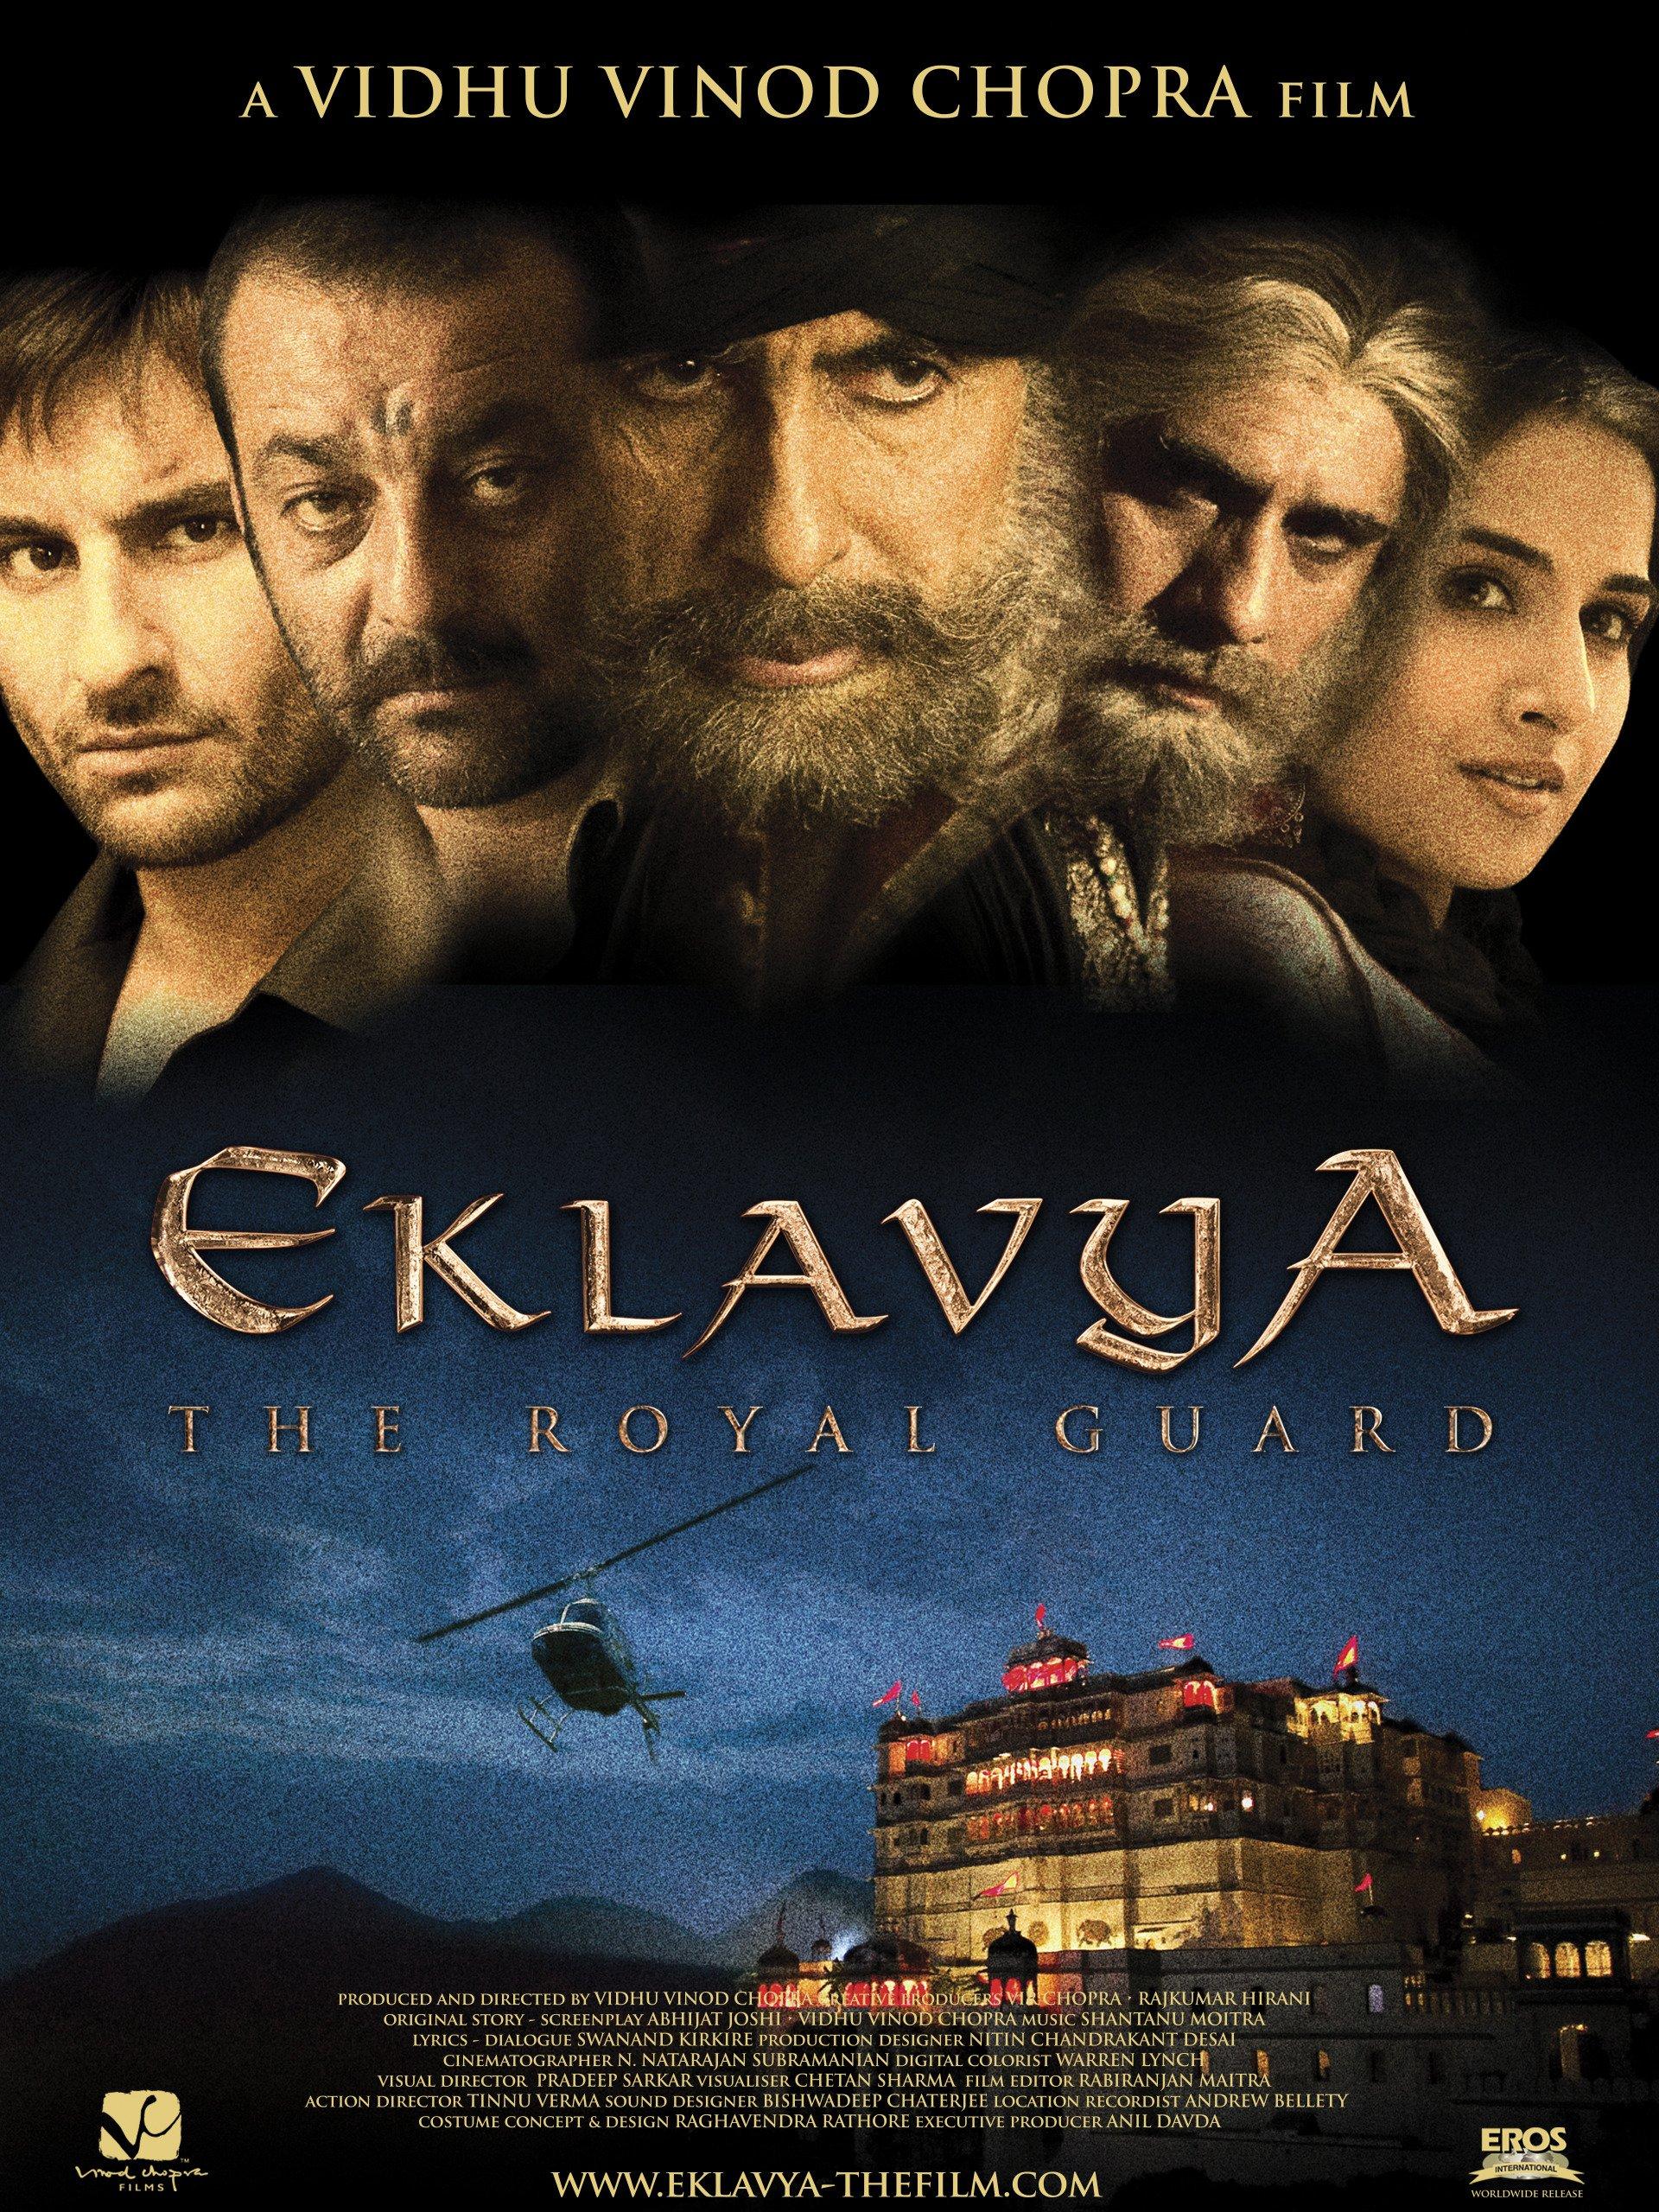 Eklavya: The Royal Guard 2007 Hindi 340MB HDRip ESubs Download